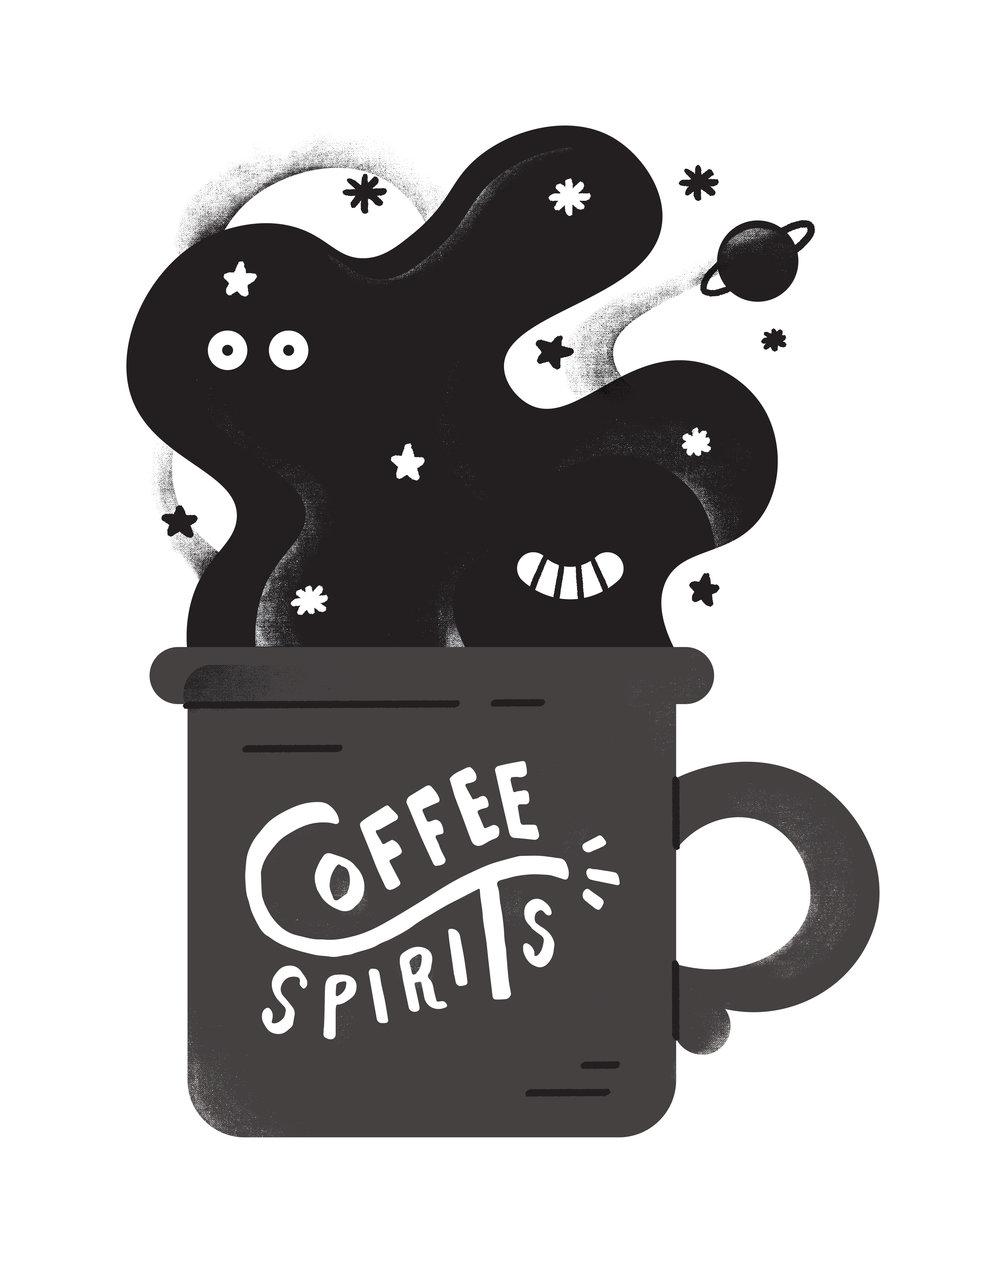 CoffeeSpirits-01.jpg